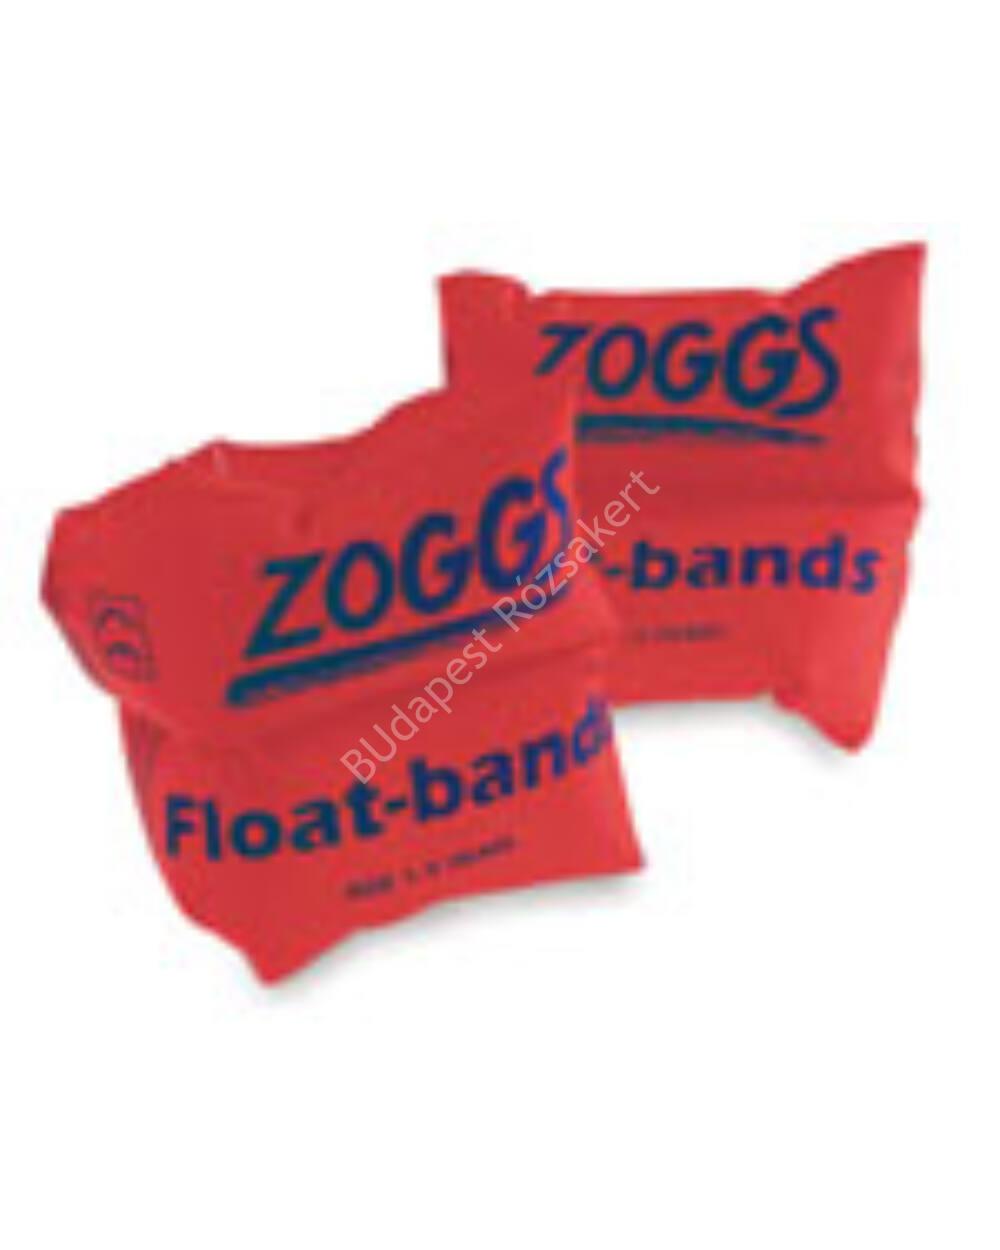 Zoggs karúszó 1-3 éves korig, max.15kg-ig